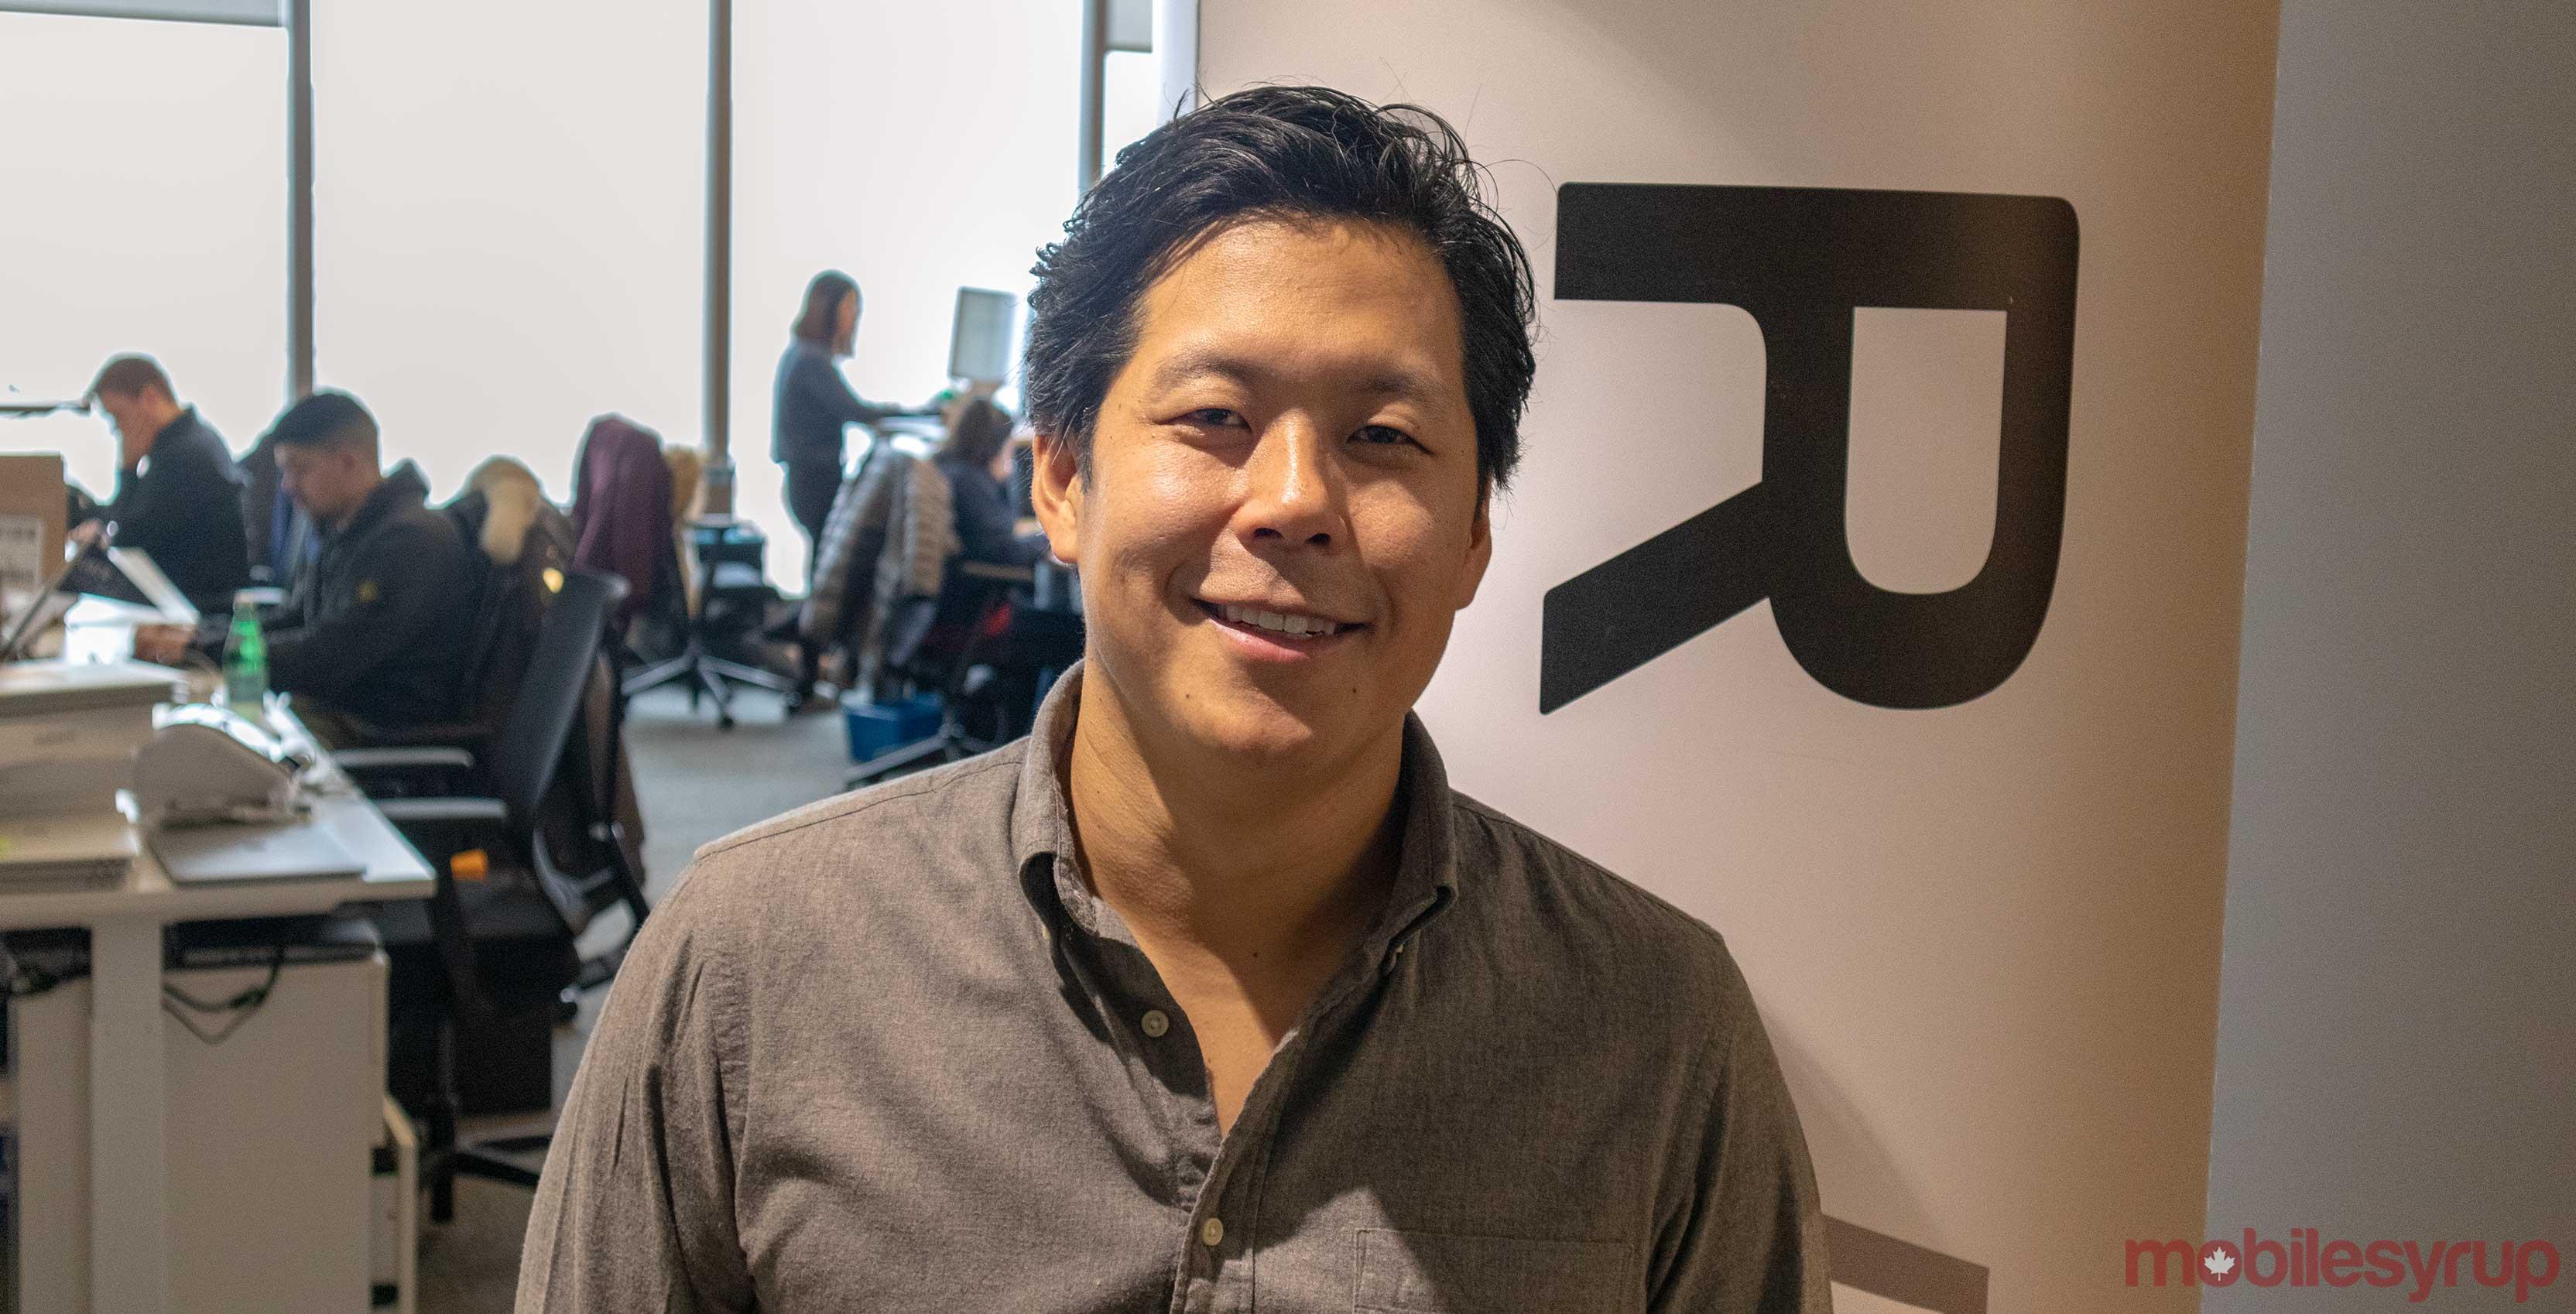 Head of Uber Eats Canada says hiring grocery team is